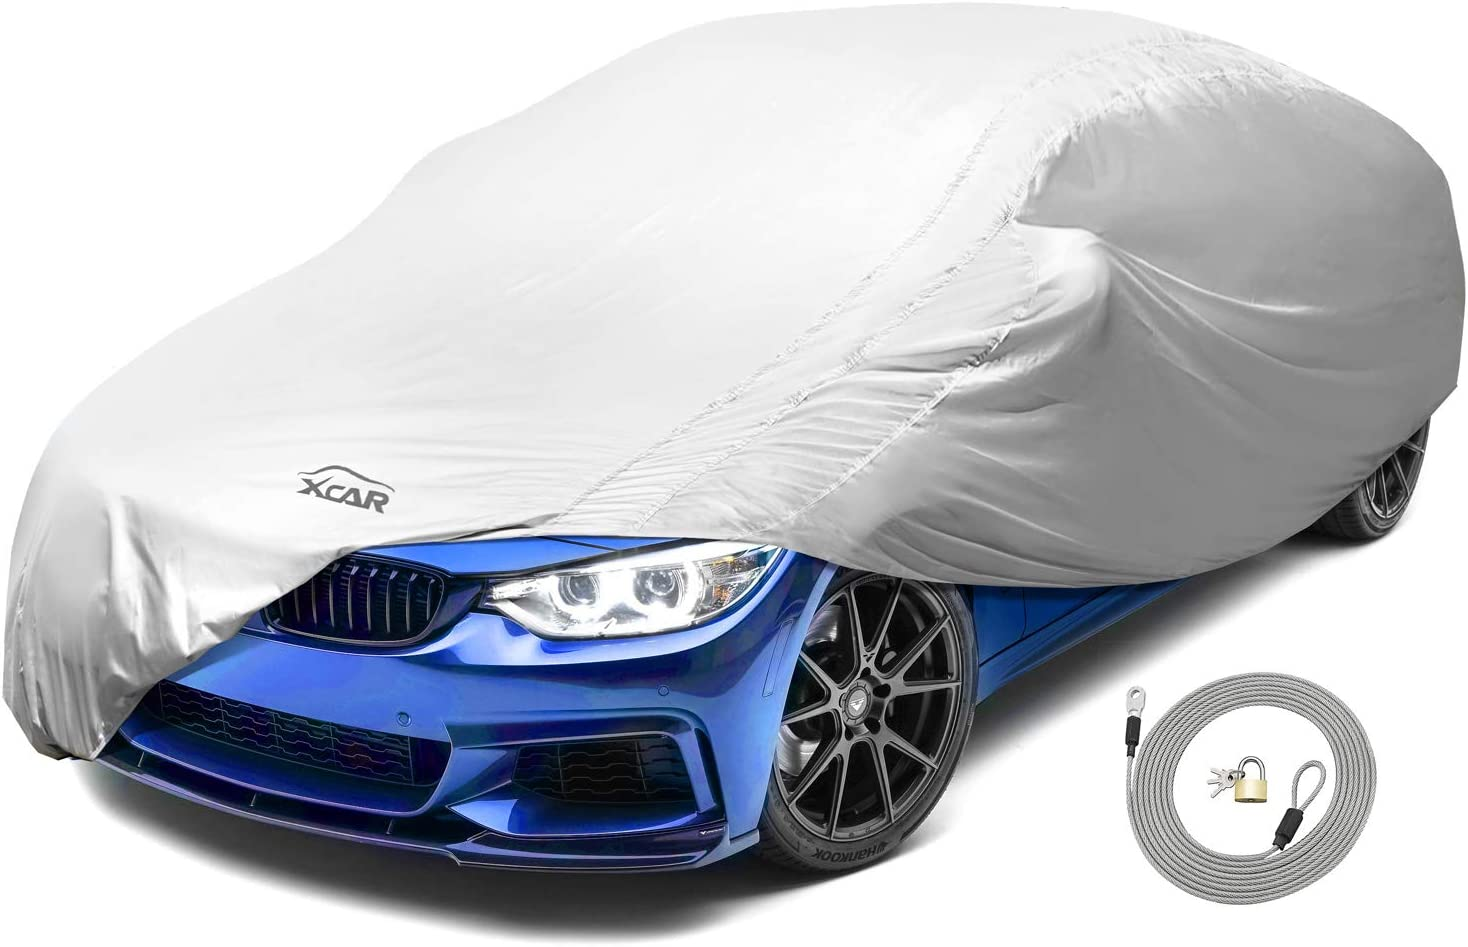 XCAR New product Solar Arlington Mall Shield Breathable UV Protection U Car Fits Cover Cars